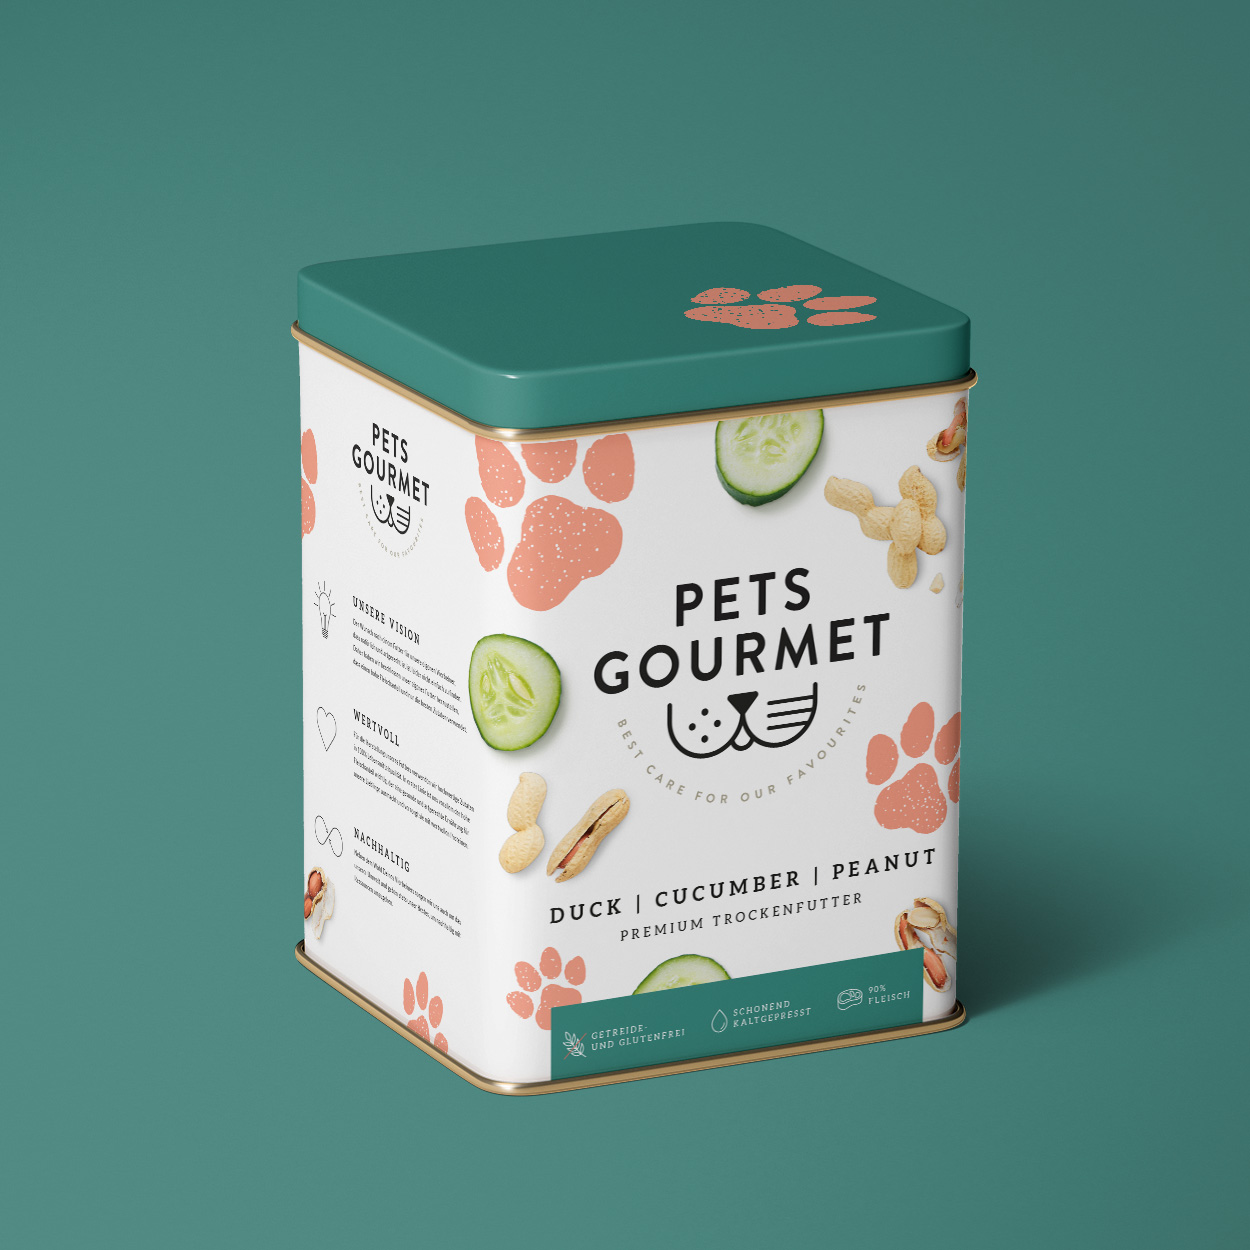 Pets_Gourmet_05